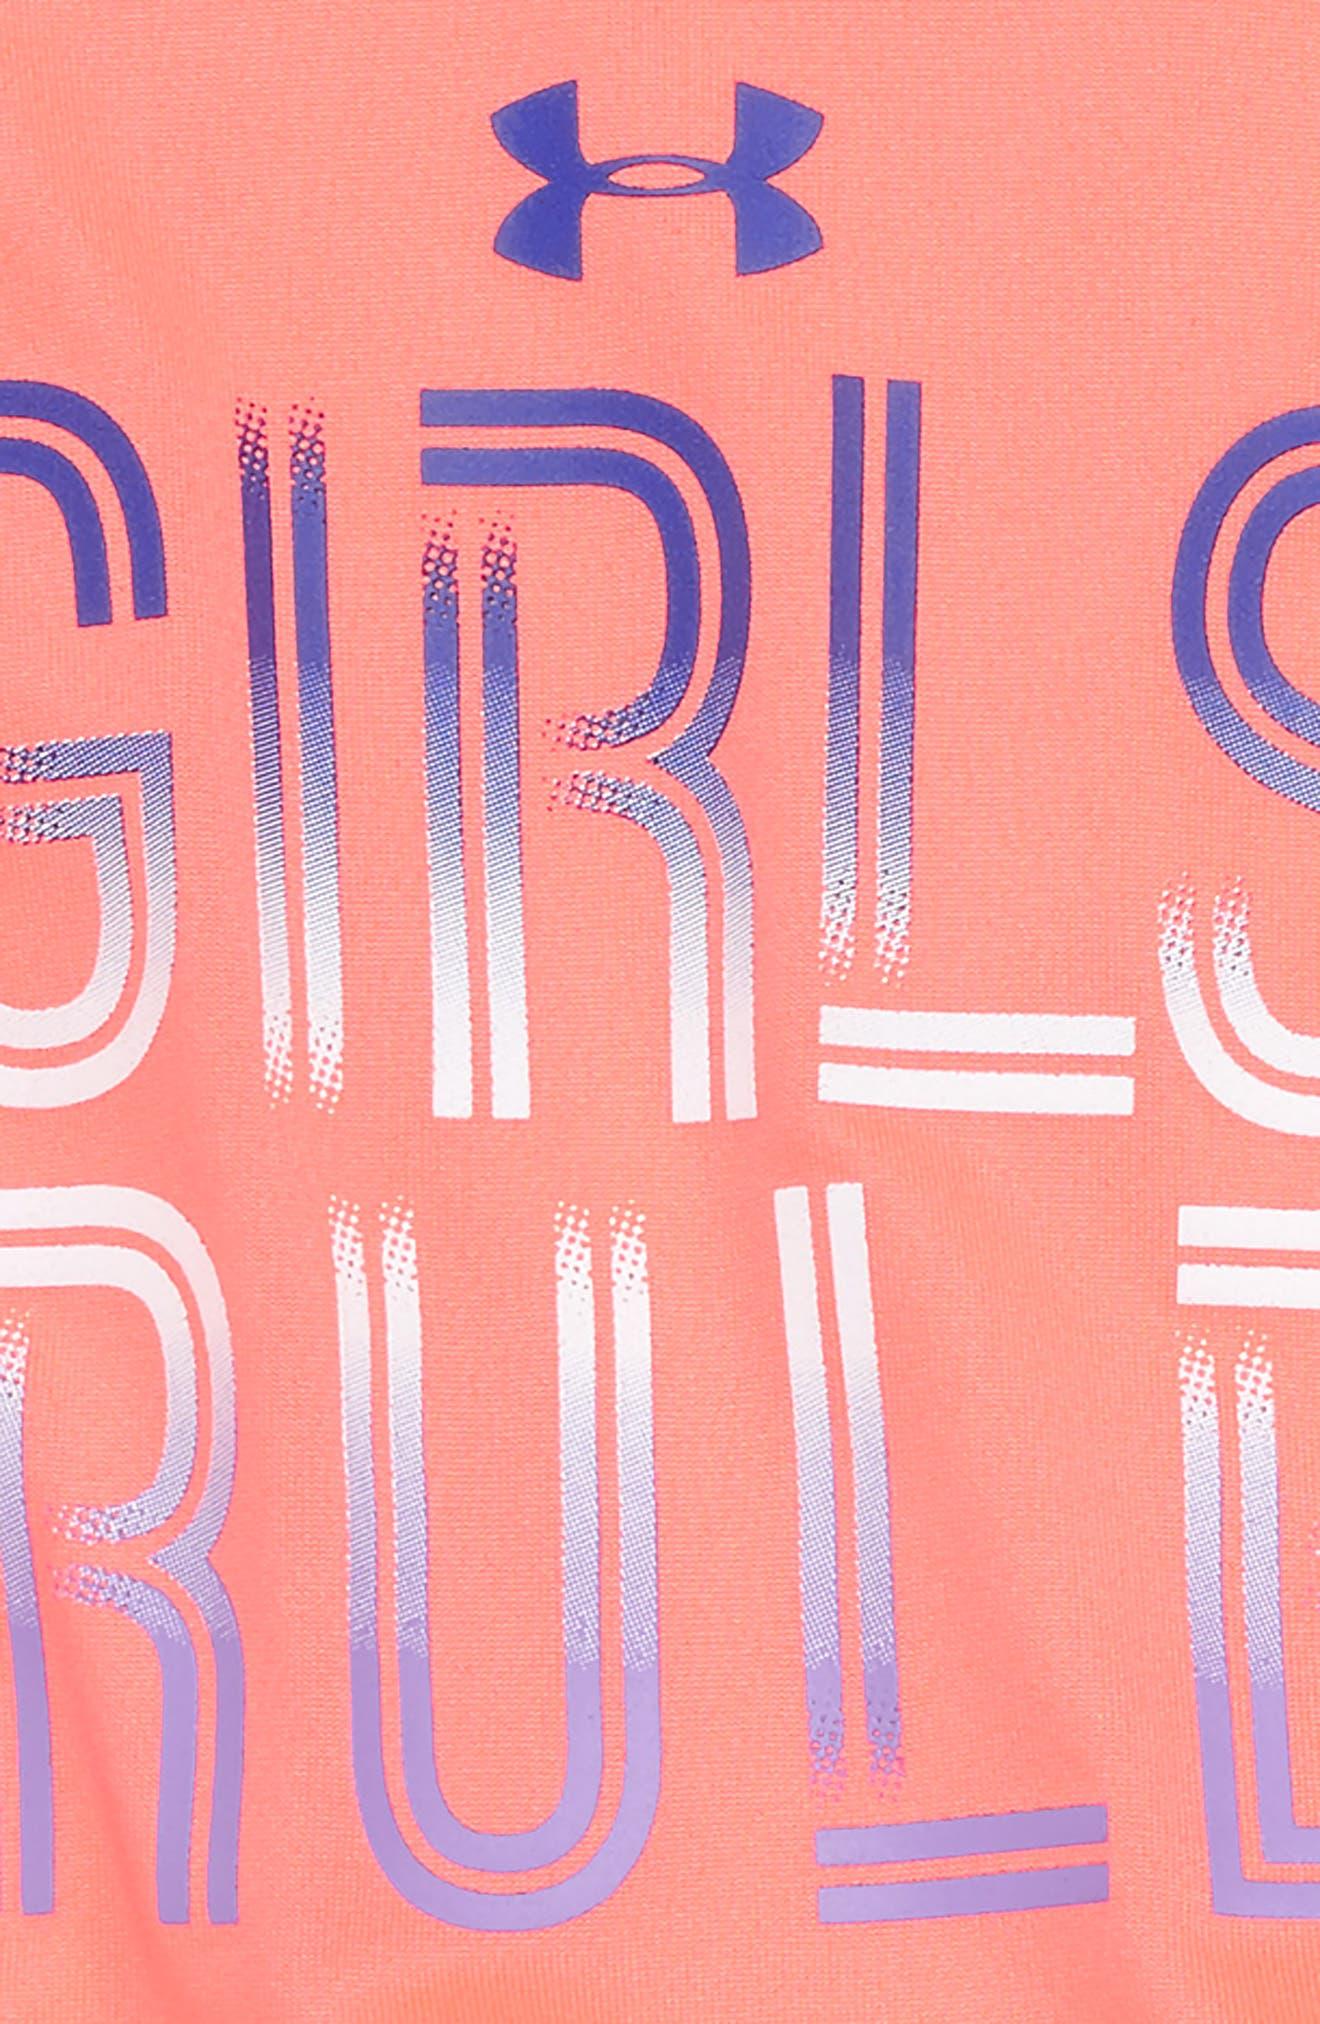 Girls Rule Tee & Shorts Set,                             Alternate thumbnail 2, color,                             Brillance